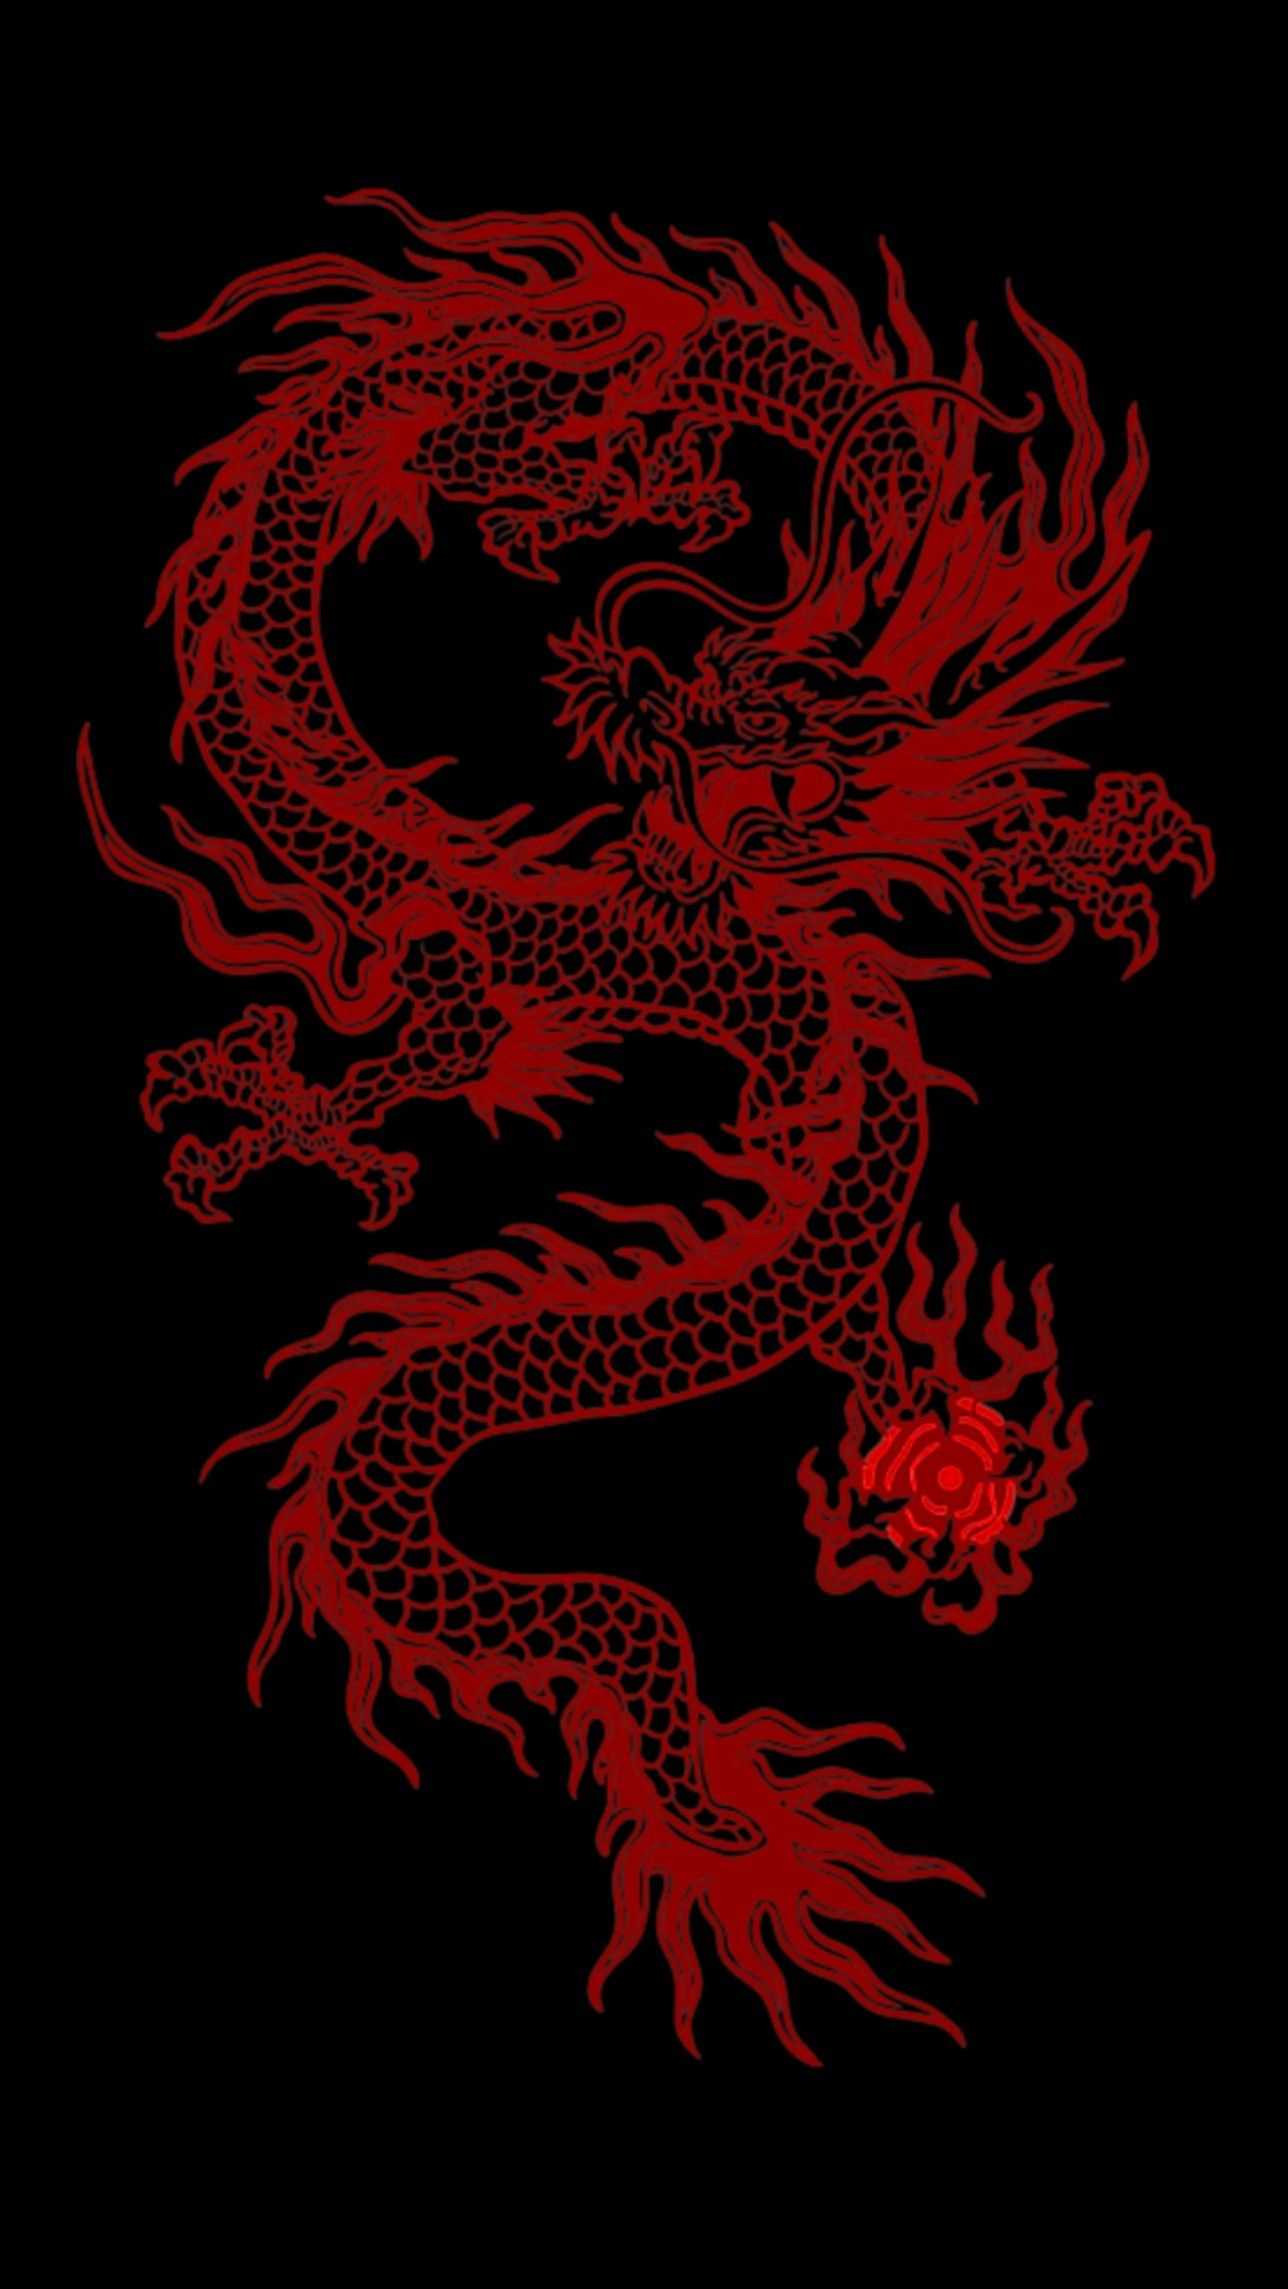 Red Dragon Geometricheskij Poster Kladbishenskie Statui Krasnyj Drakon